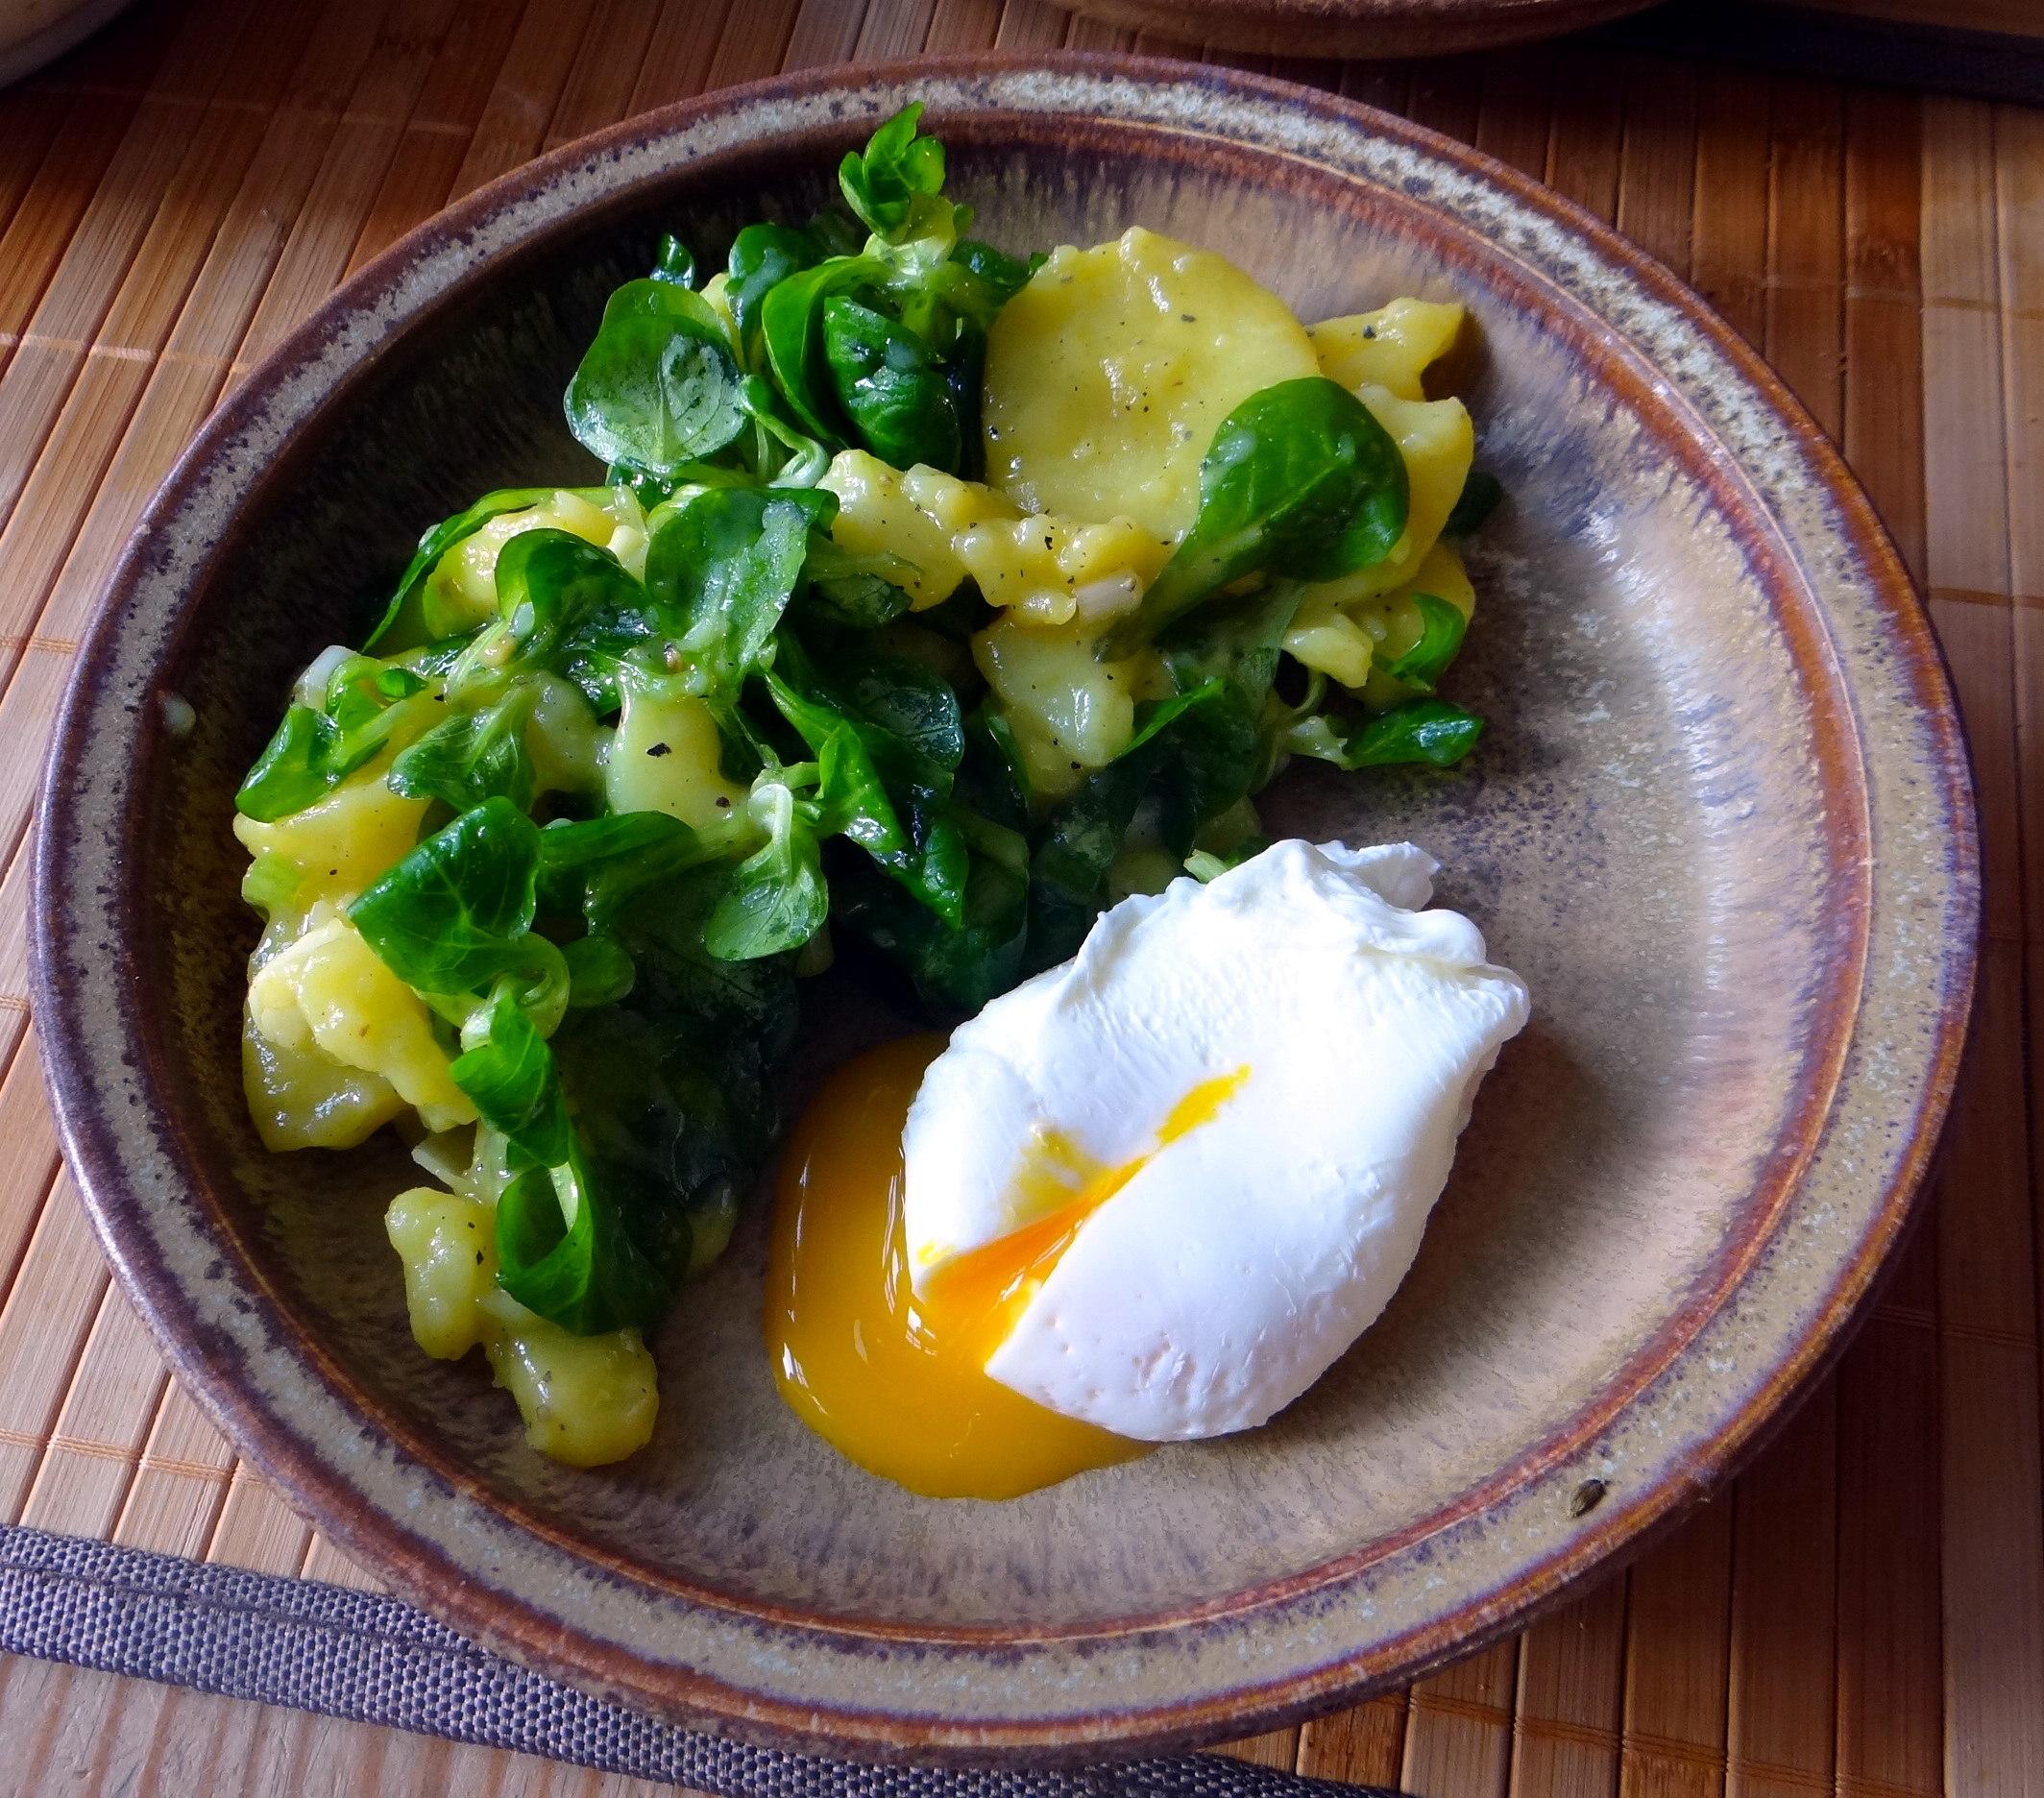 Schlotziger Kartoffelsalat,poschierte Eier,Quarkspeise (3)